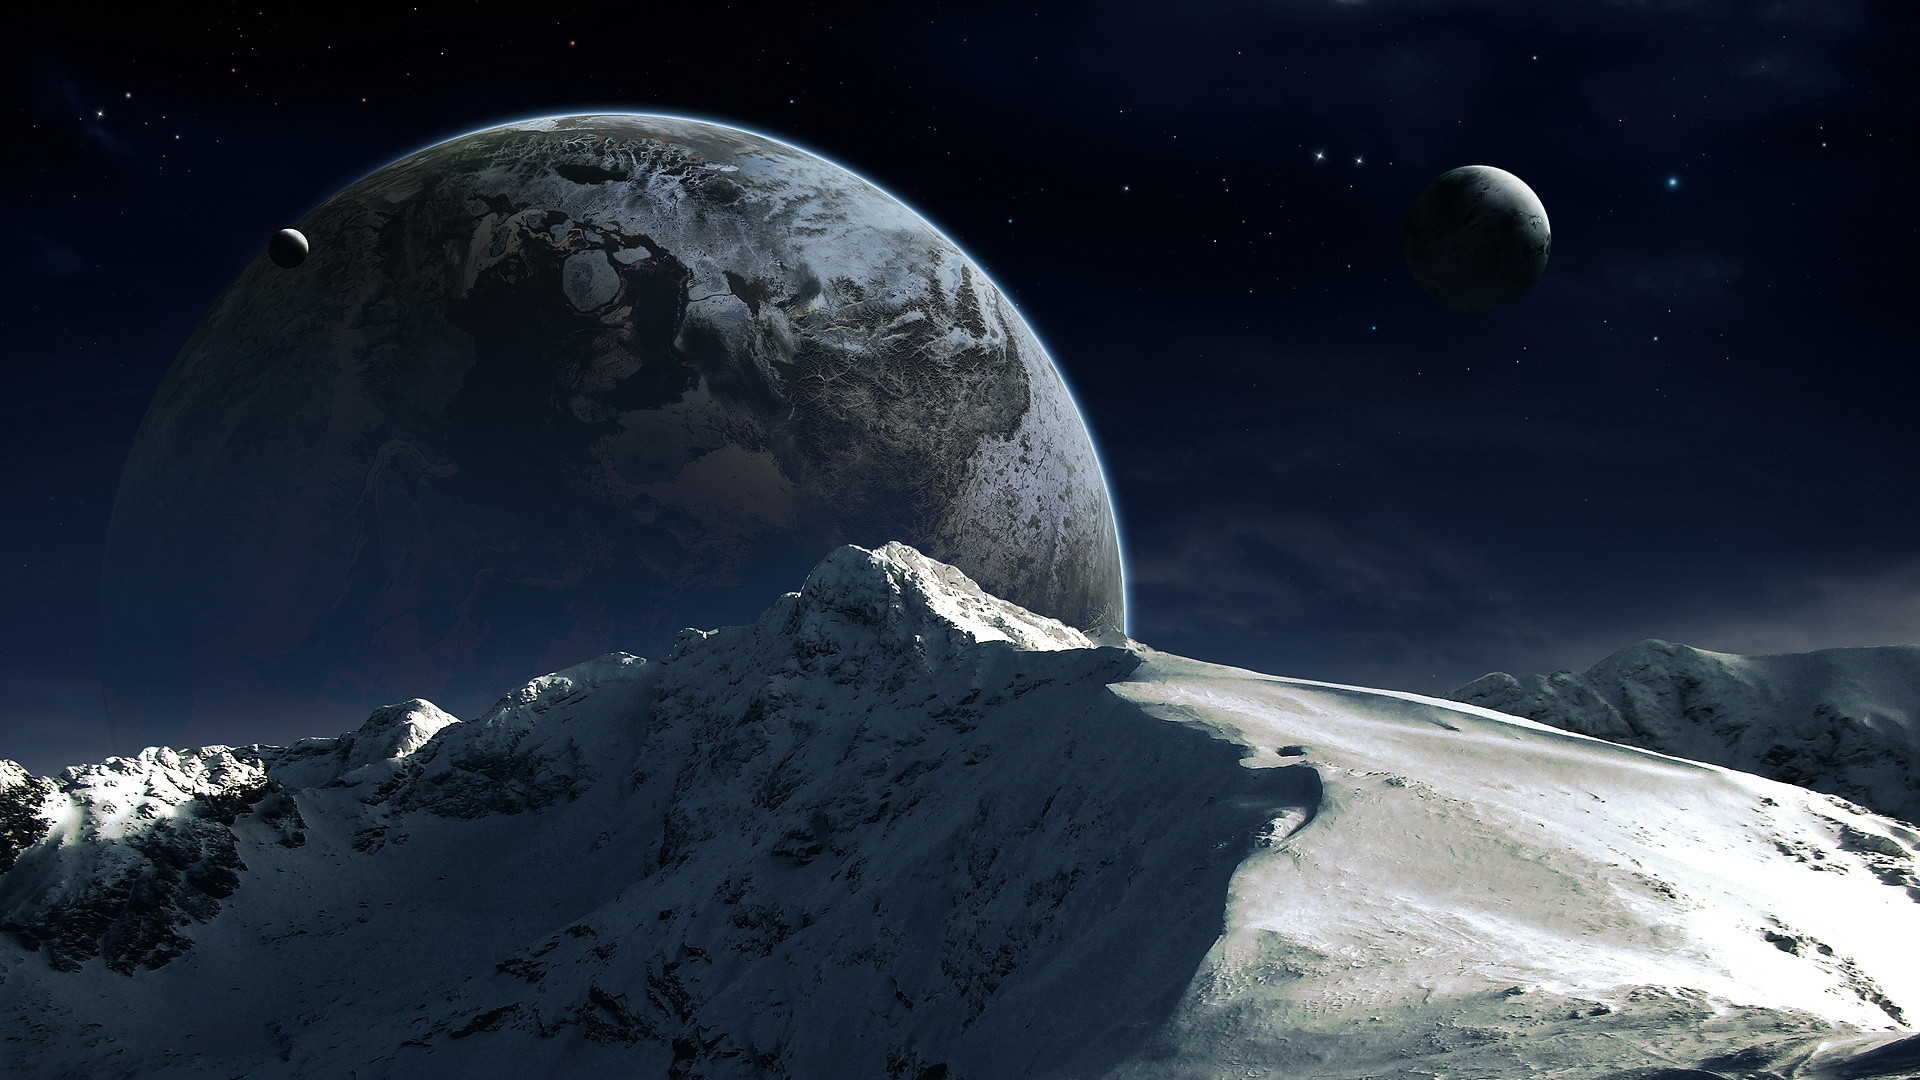 sci fi landscape Wallpaper Backgrounds